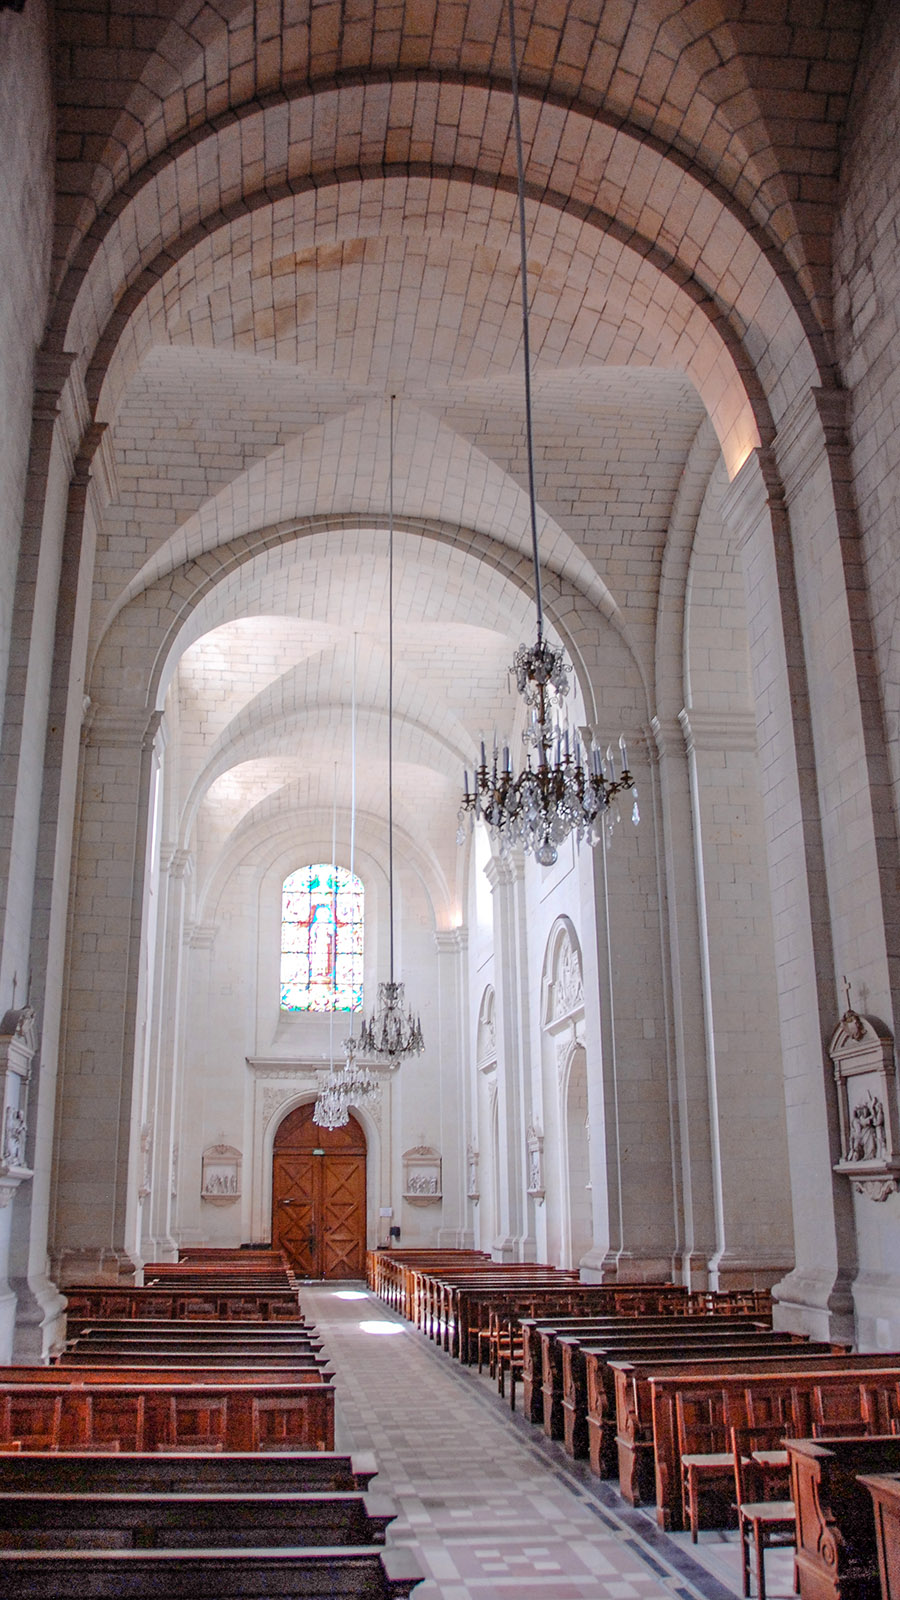 Saint-Florent-le-Vieil: Abteikirche. Foto: Hilke Maunder